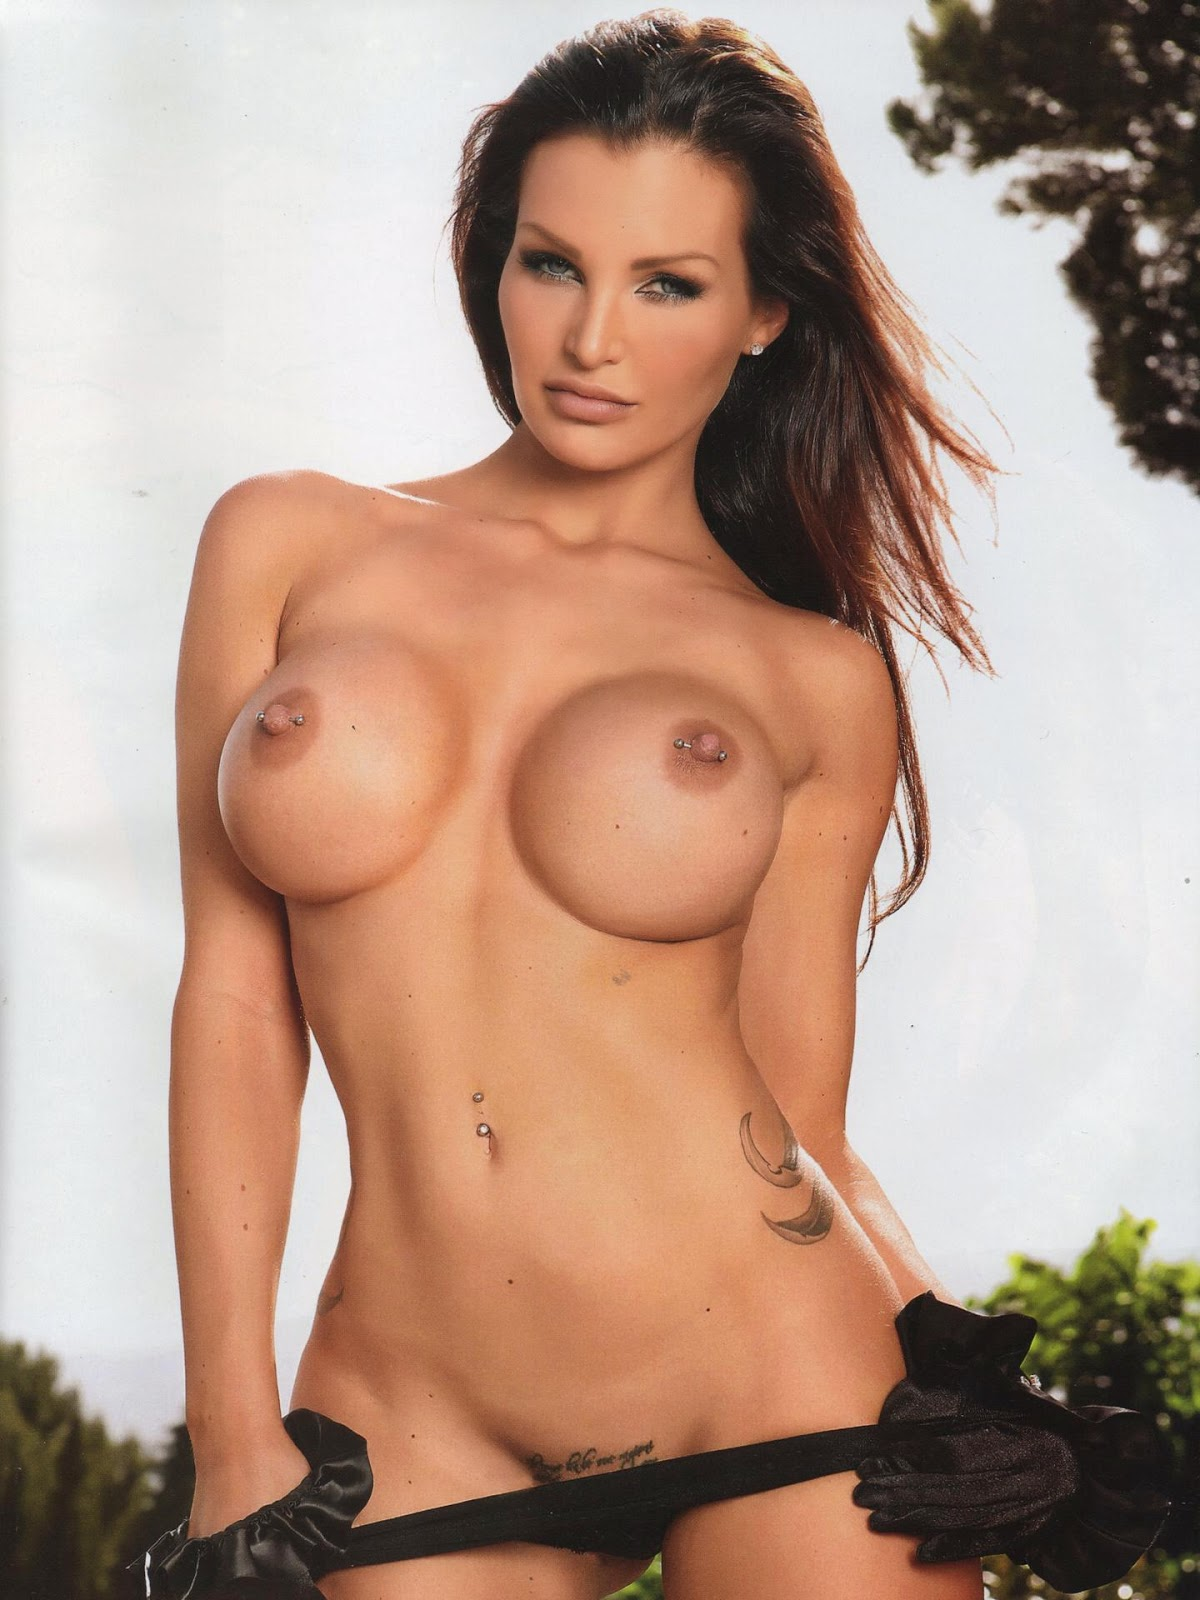 Helen de muro tits